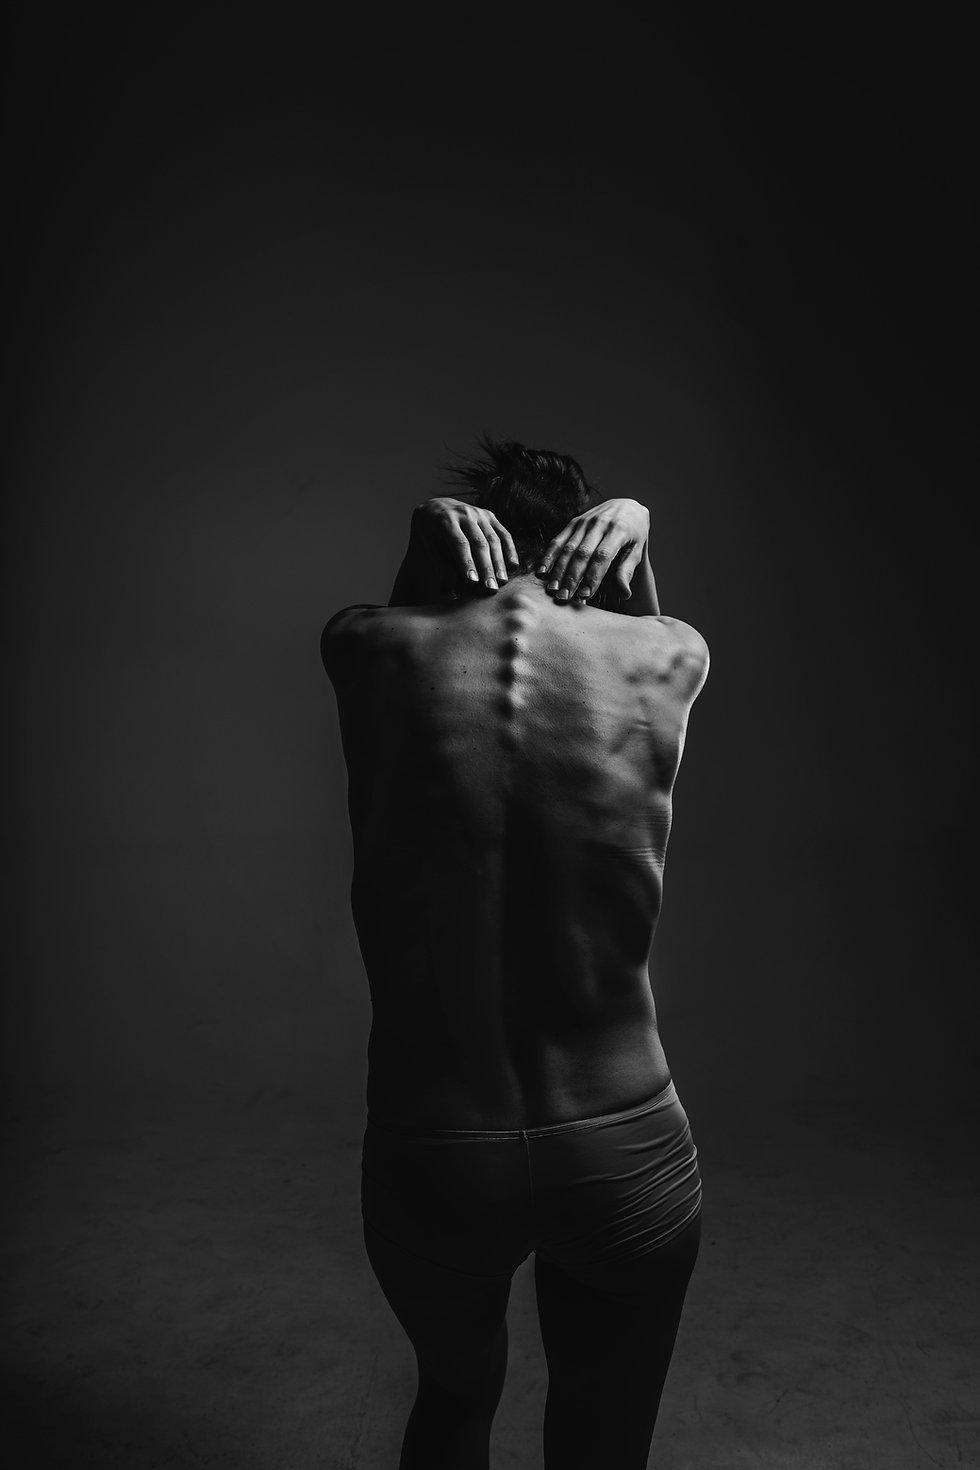 Image by Olenka Kotyk